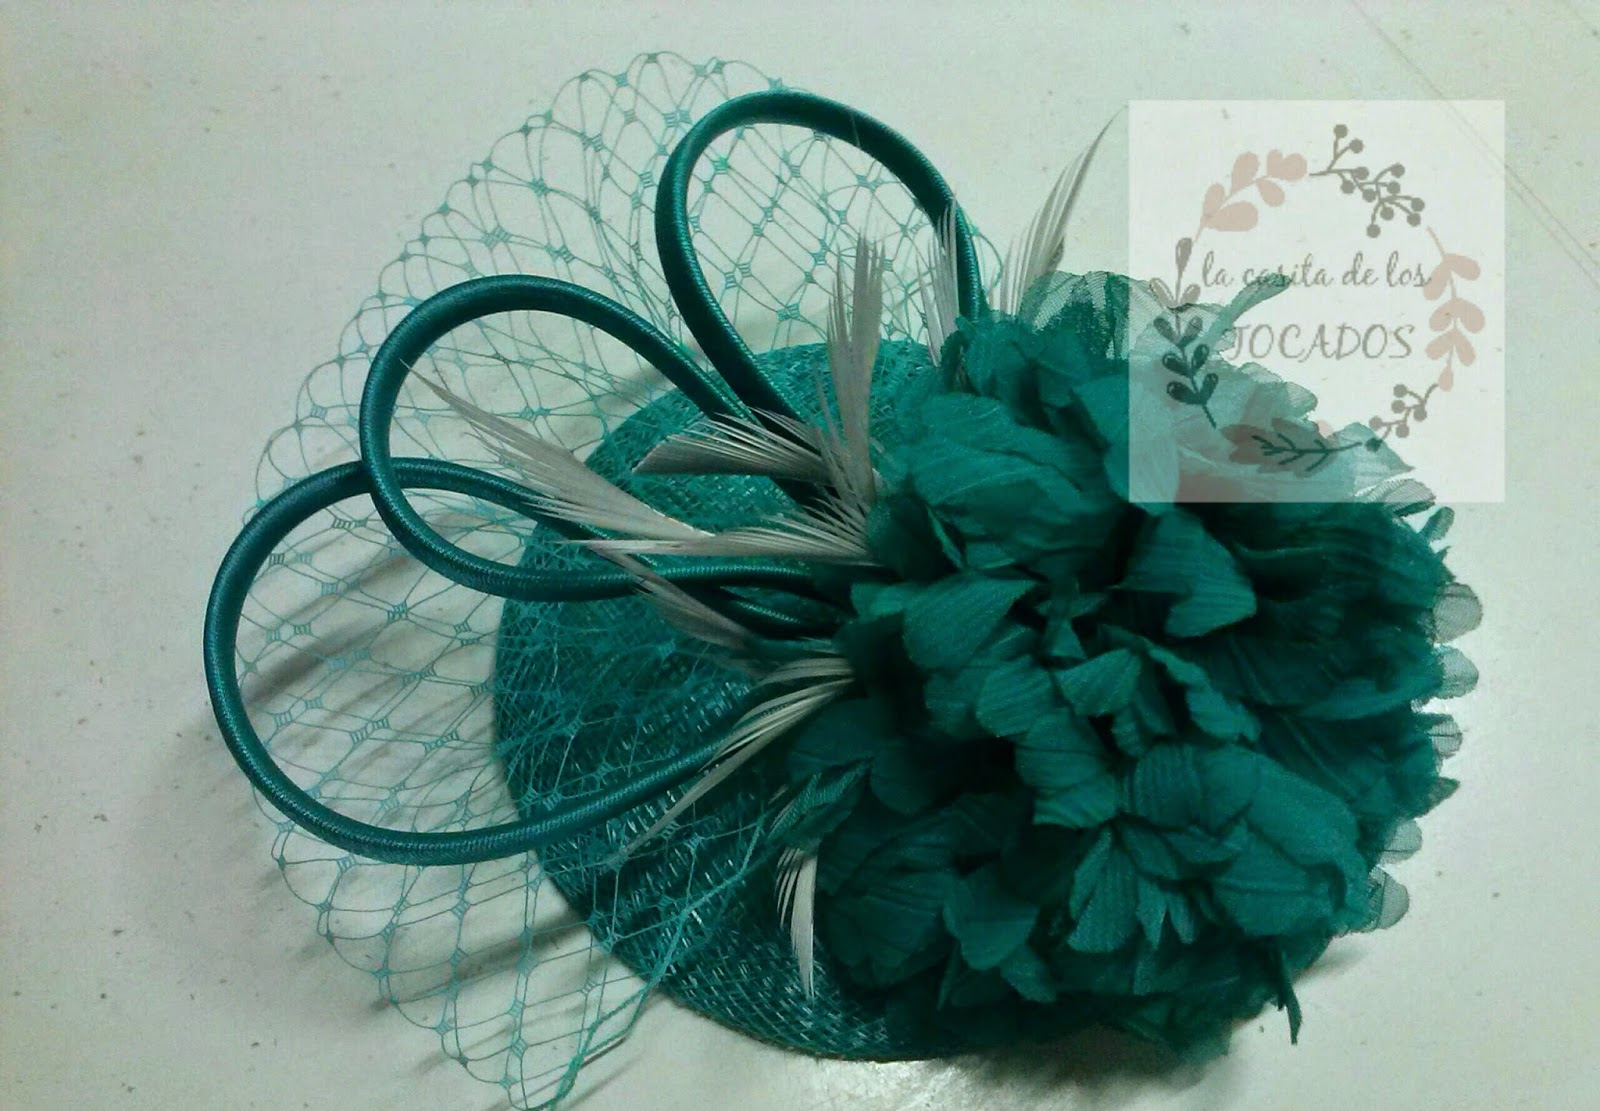 tocado pequeño para boda con flor, velo y plumas,  económico para boda